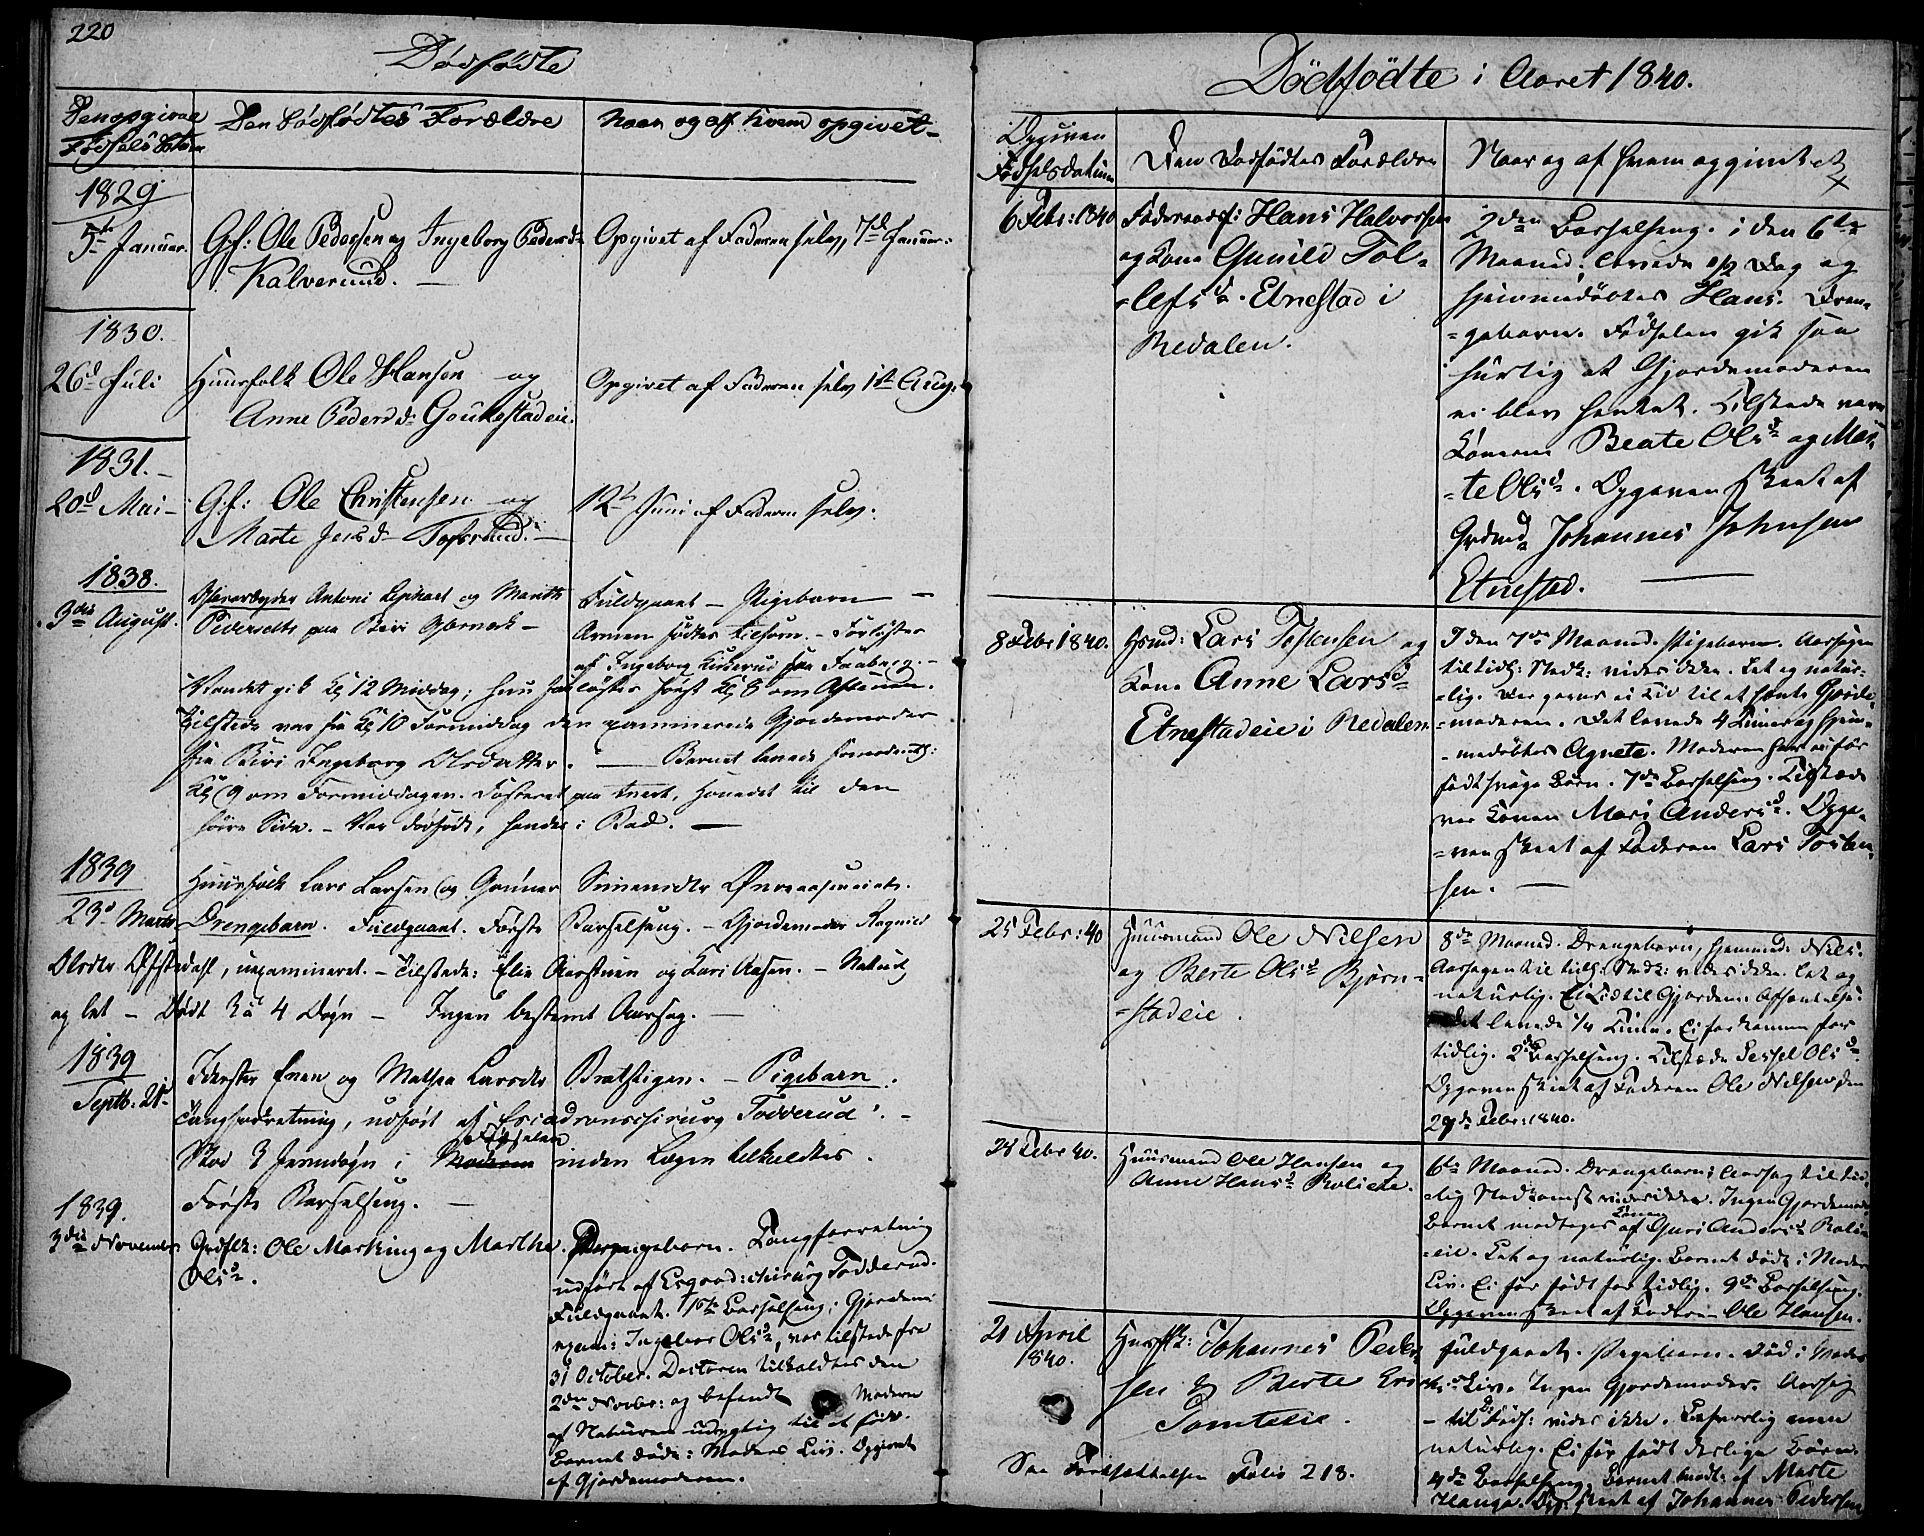 SAH, Biri prestekontor, Ministerialbok nr. 4, 1829-1842, s. 220